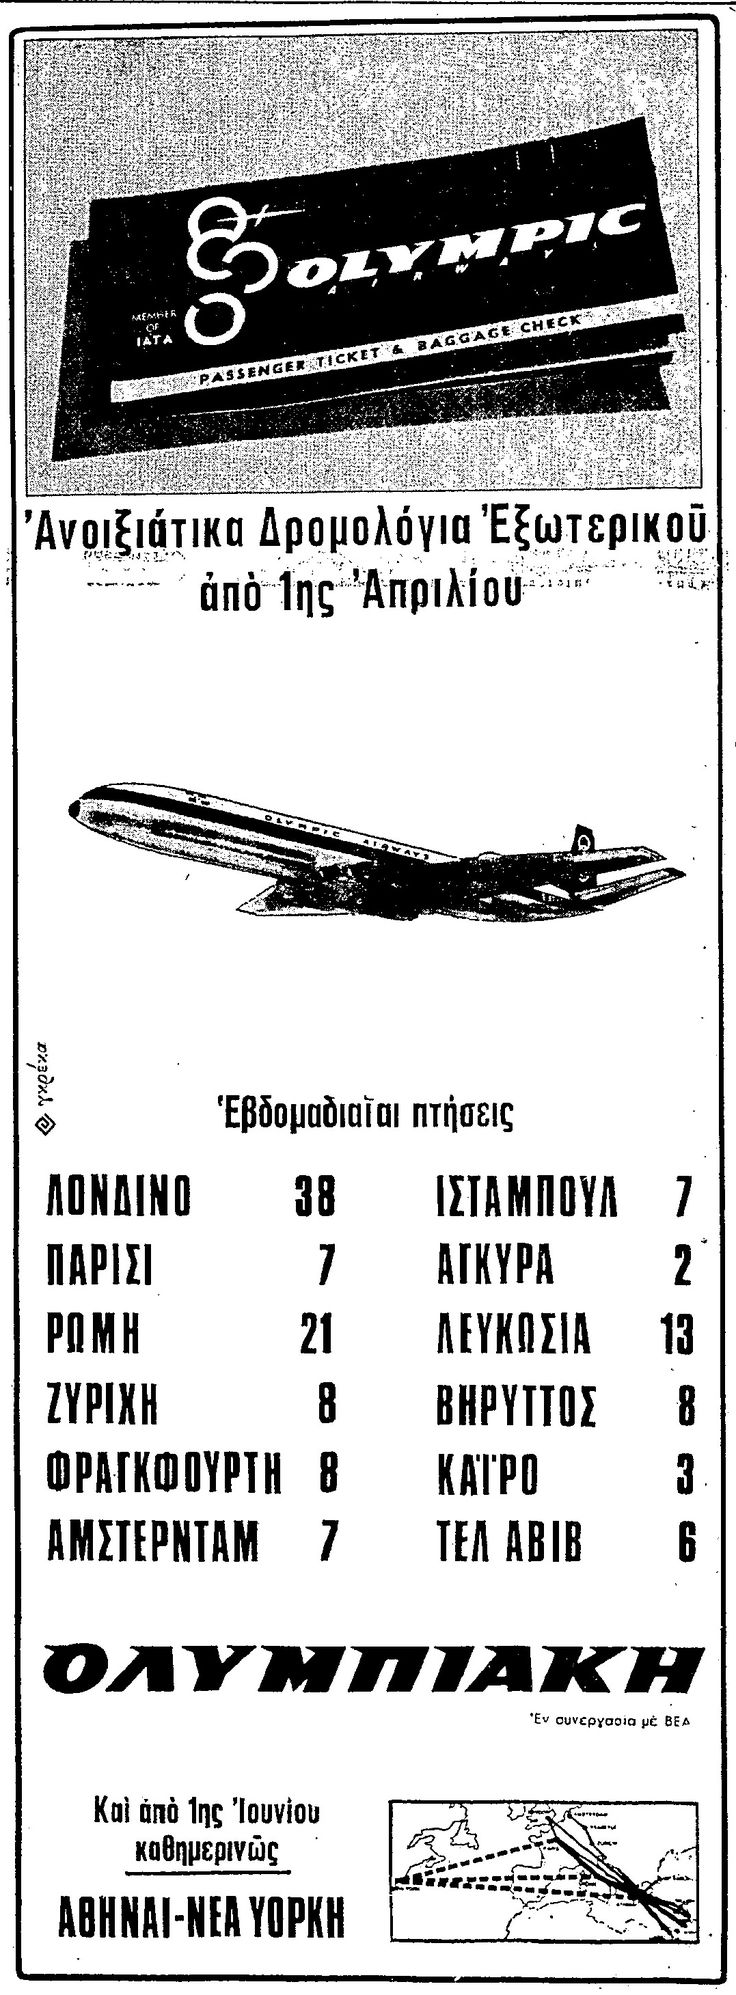 Olympic Airways, δρομολόγια εξωτερικού 1966